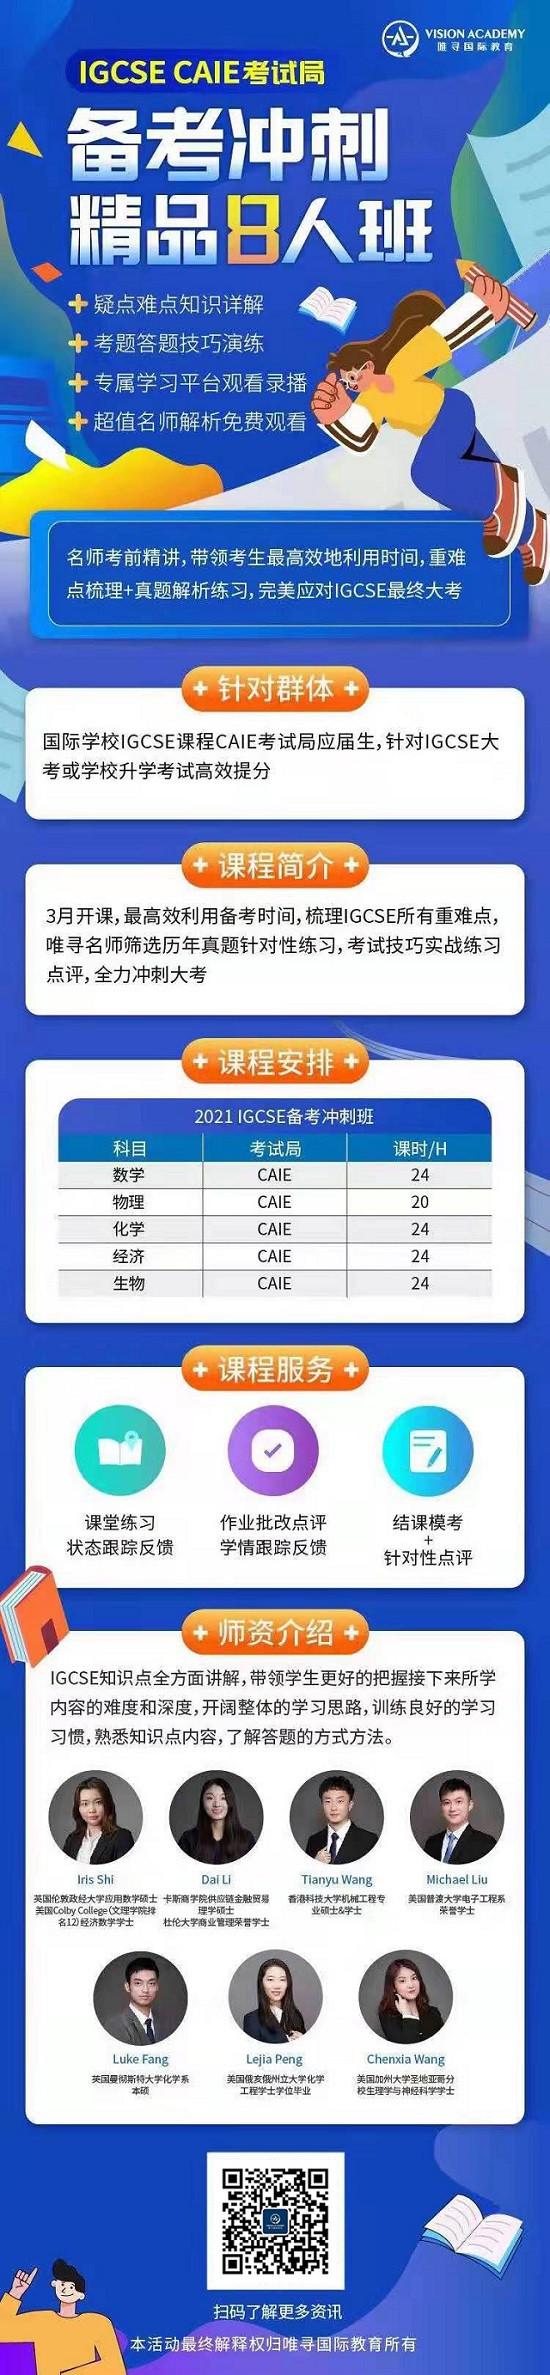 igcse和myp的区别有哪些?学习内容 学费 认可度都有很大不同内容图片_2